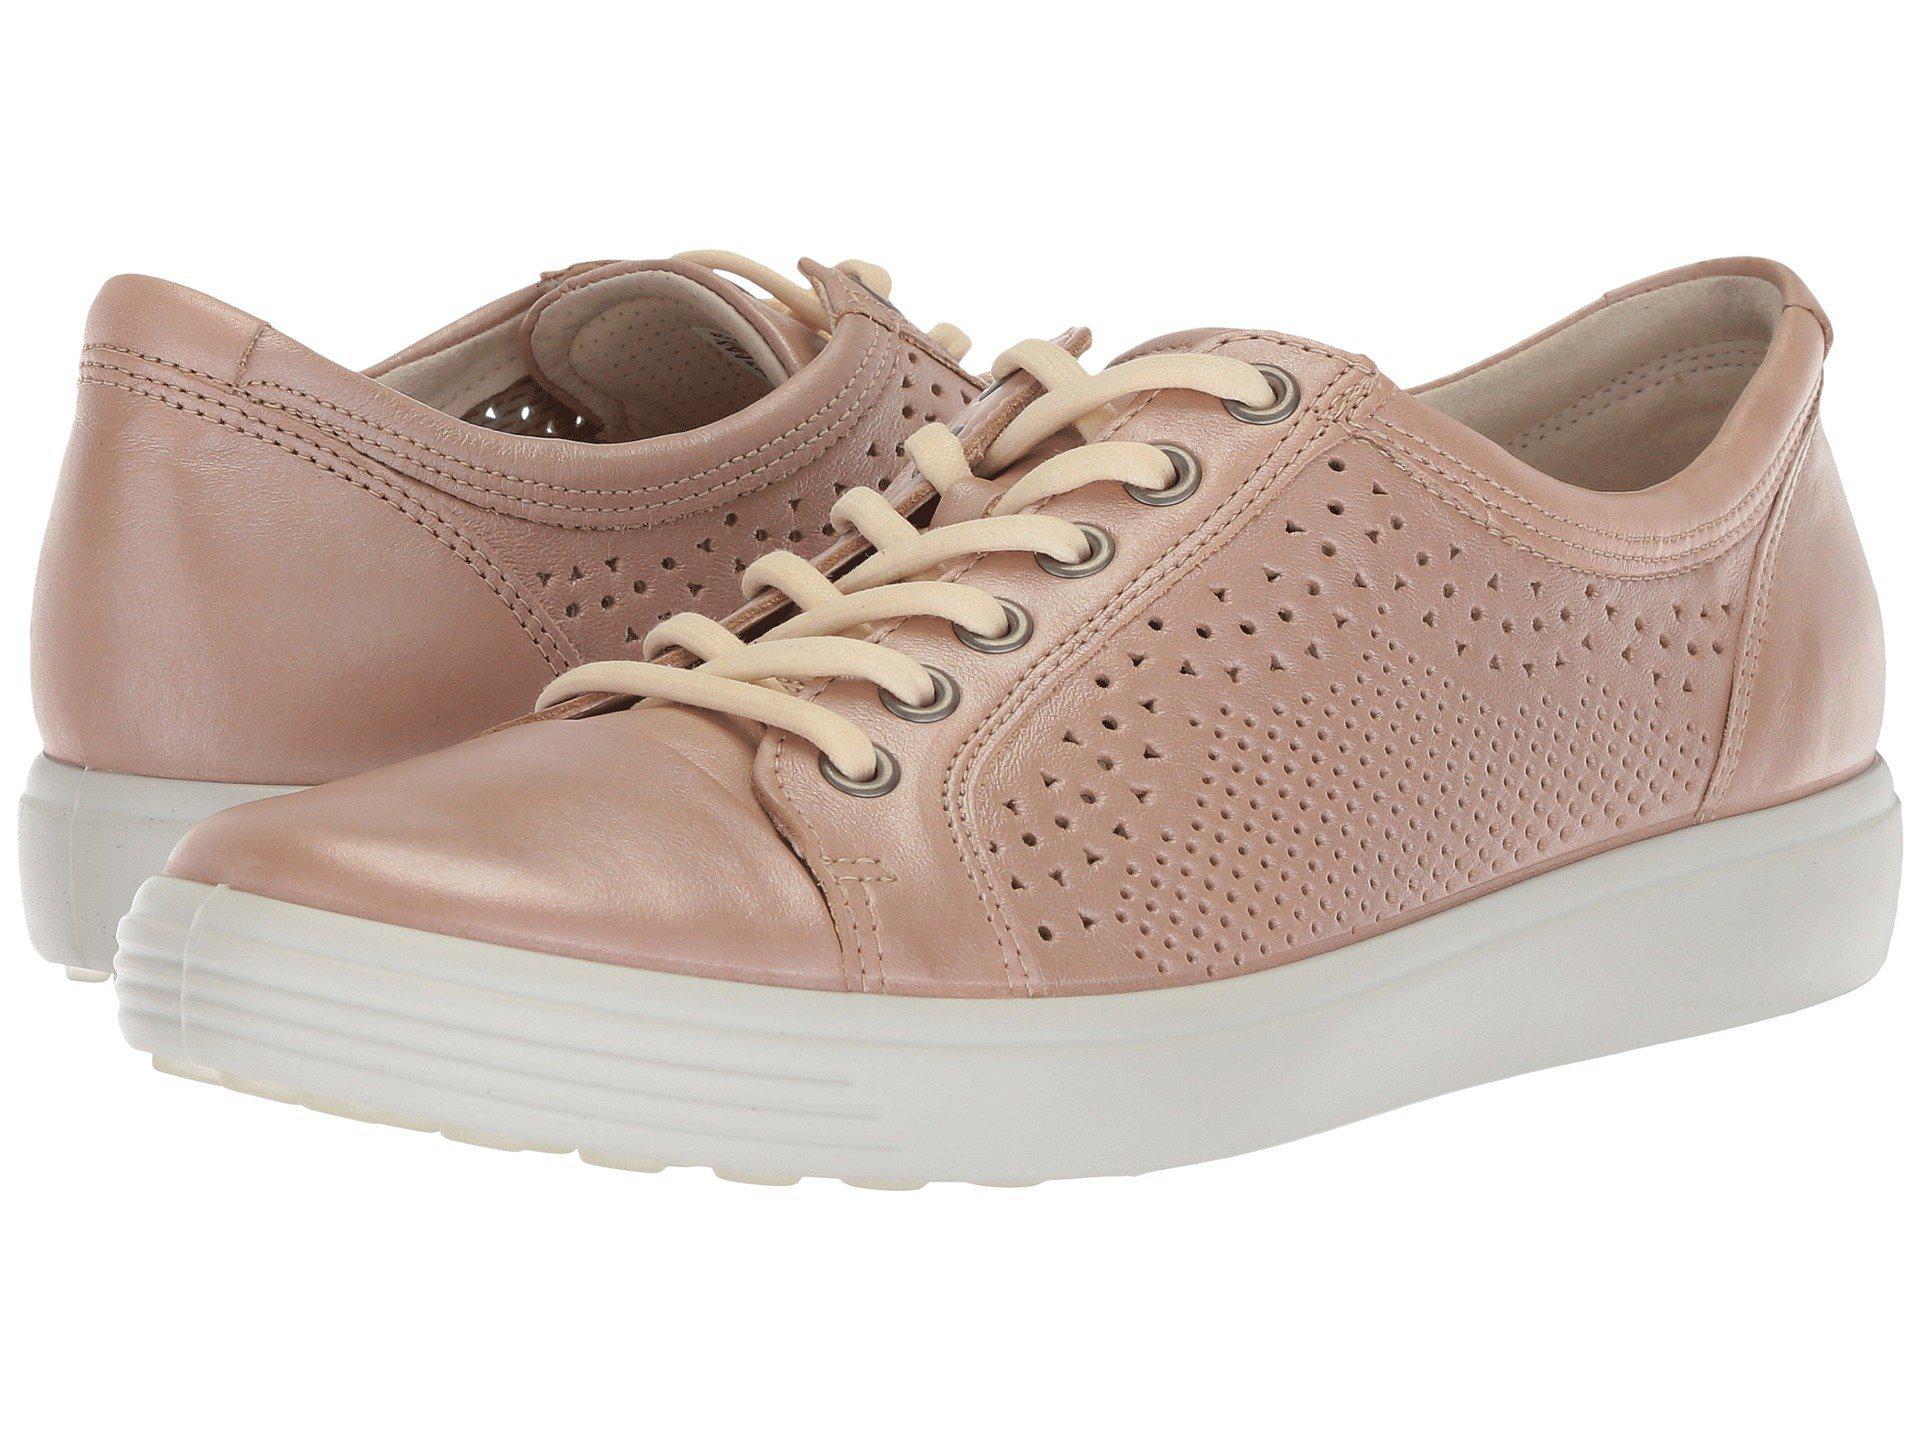 Ecco Leather Soft 7 Trend Tie Sneaker